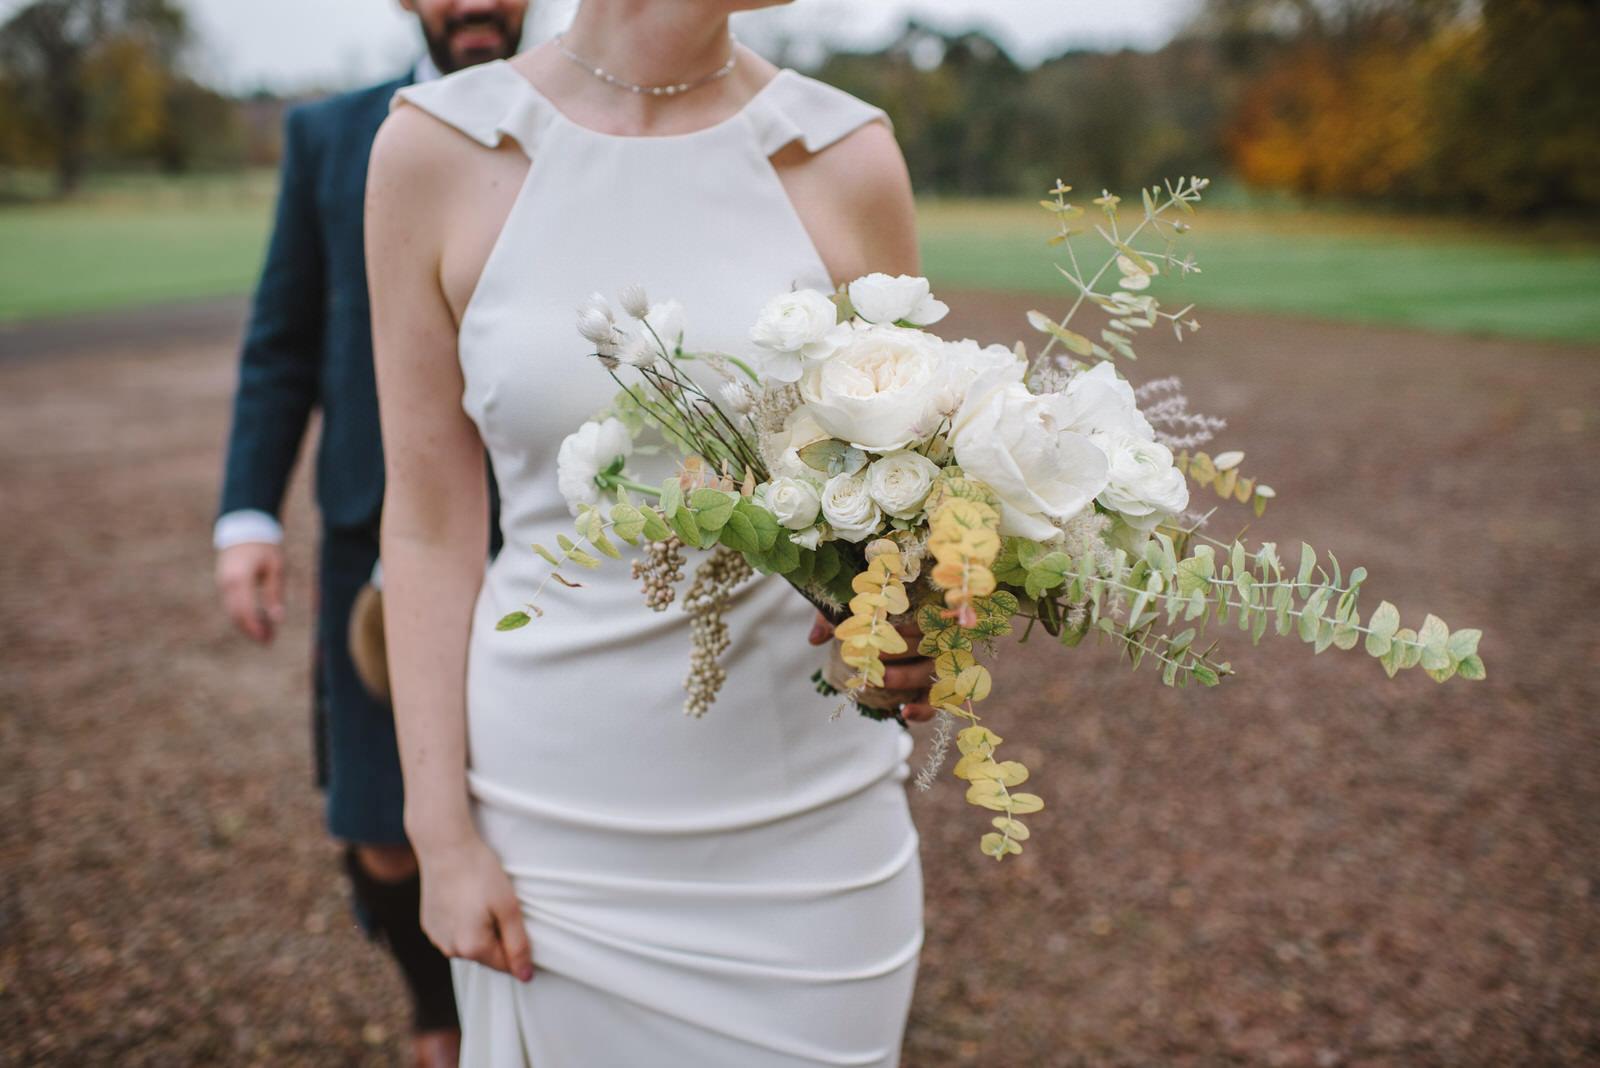 019-COLSTOUN-HOUSE-WEDDING-ALTERNATIVE-WEDDING-PHOTOGRAPHER-GLASGOW-WEDDING-PHOTOGRAPHER-STYLISH-SCOTTISH-WEDDING.JPG